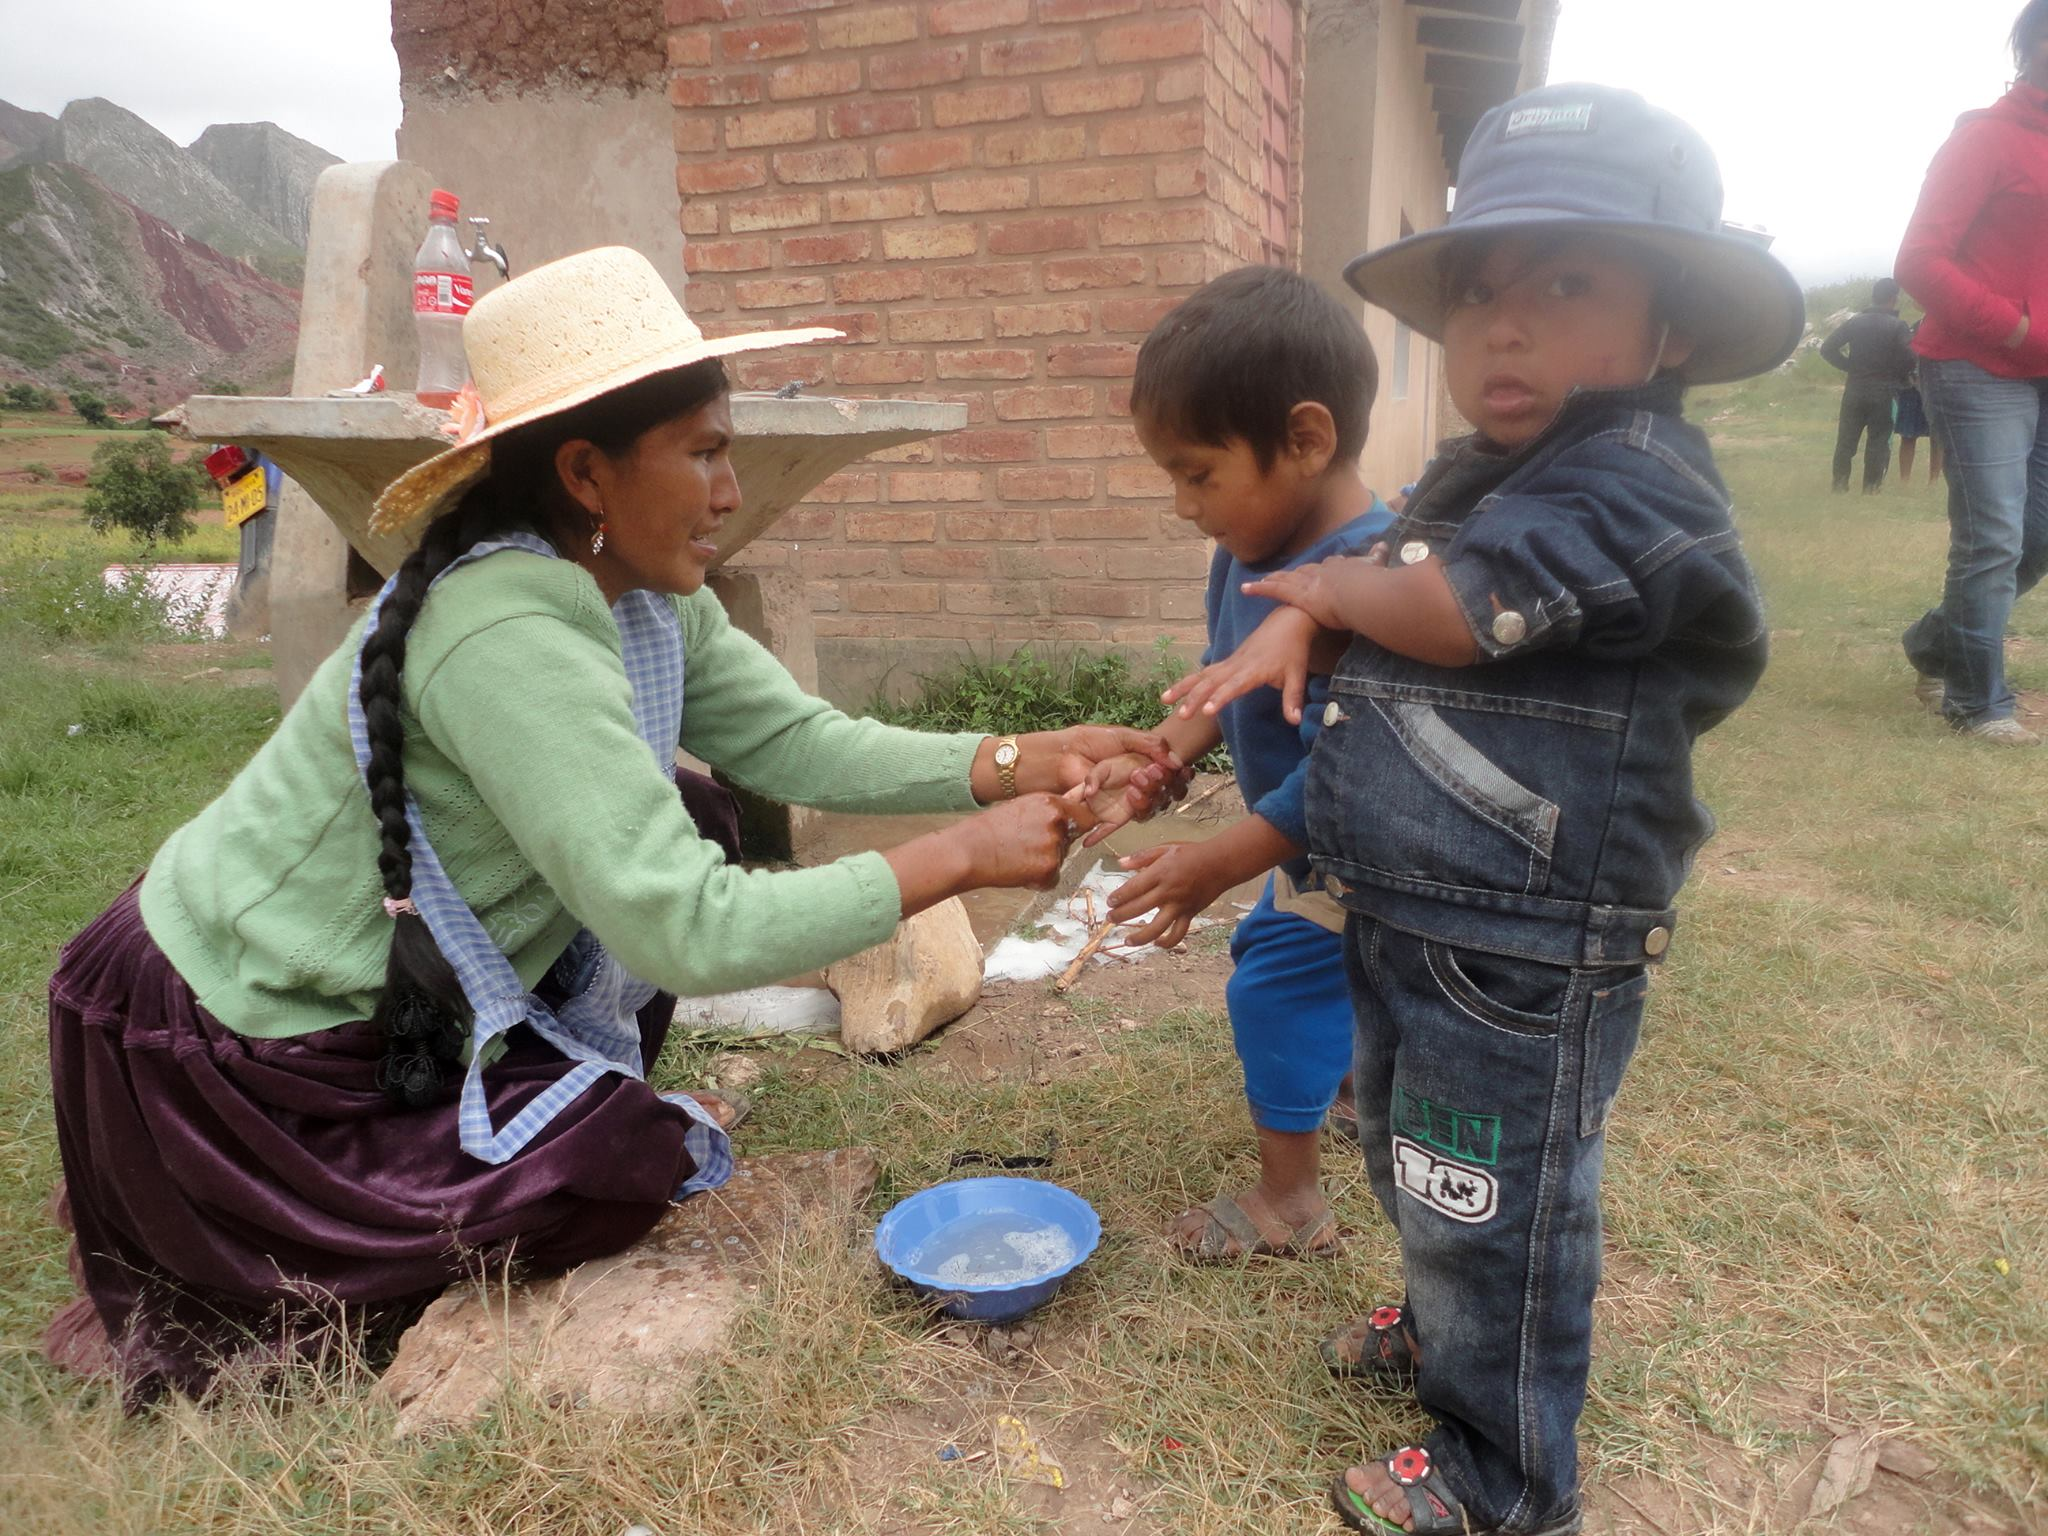 Sponsor a child, transform a community